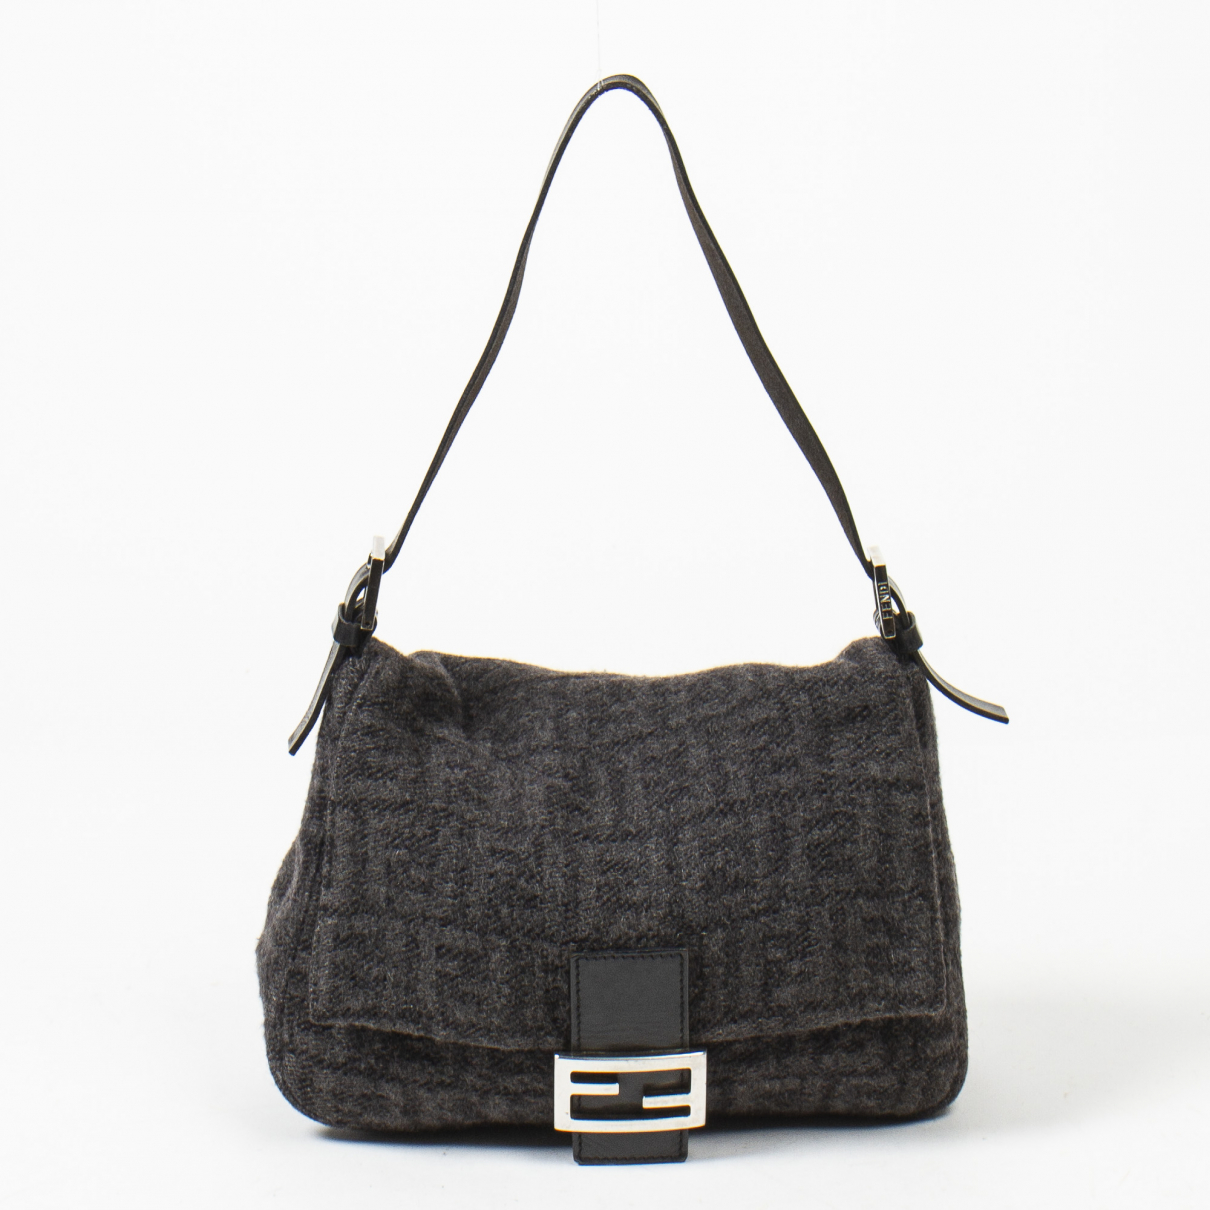 Fendi Mamma Baguette  Handtasche in  Schwarz Baumwolle